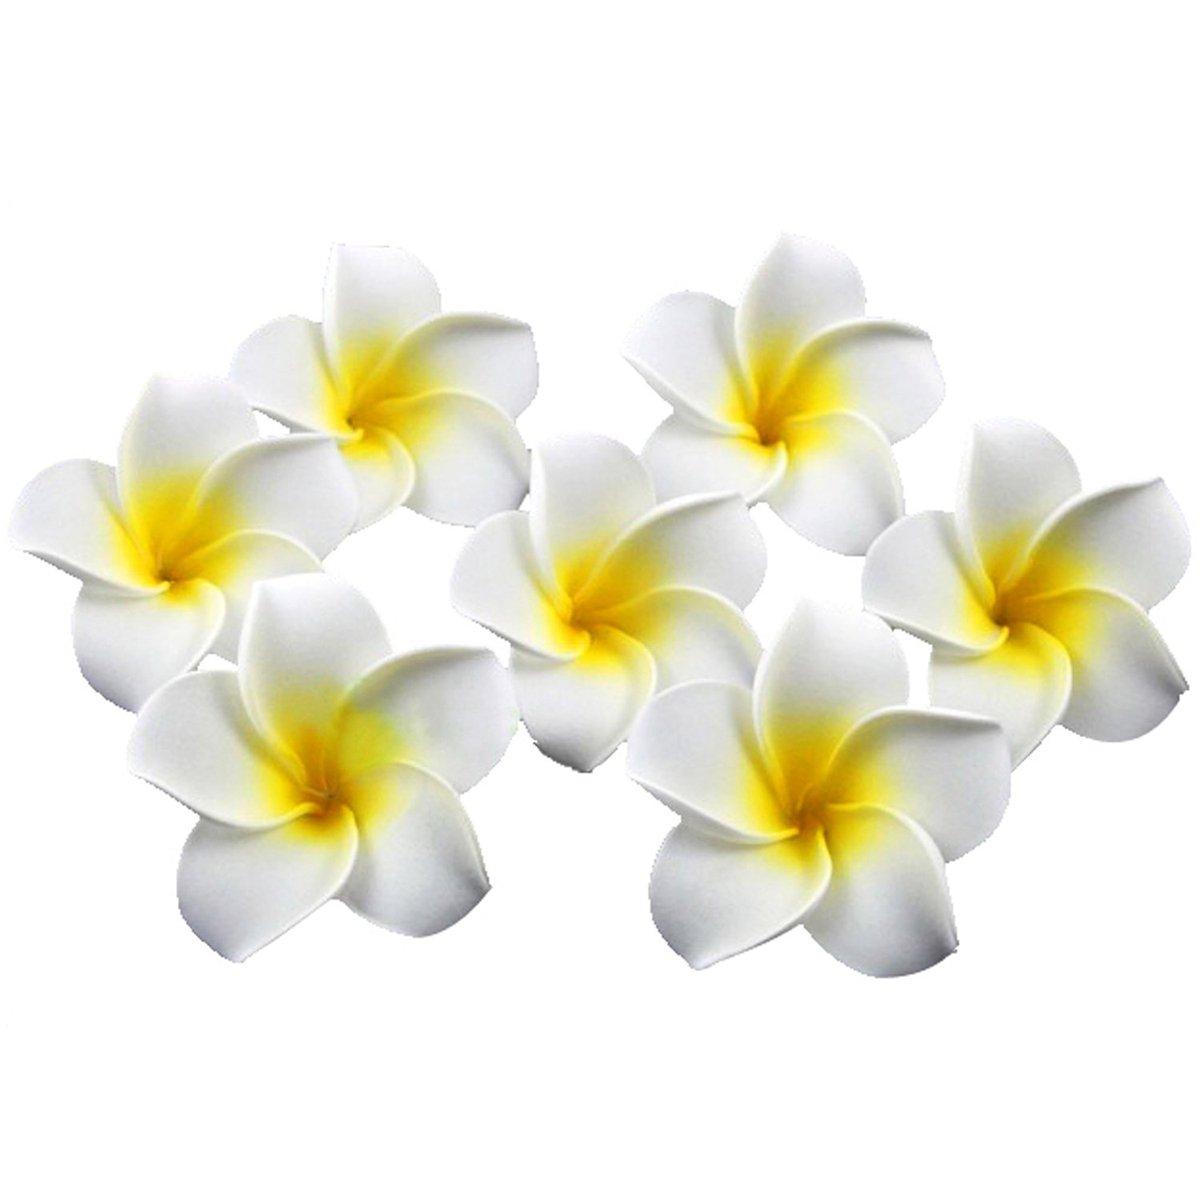 100PCS White Hawaiian Frangipani Plumeria Foam Head Flower Wedding DIY Decor